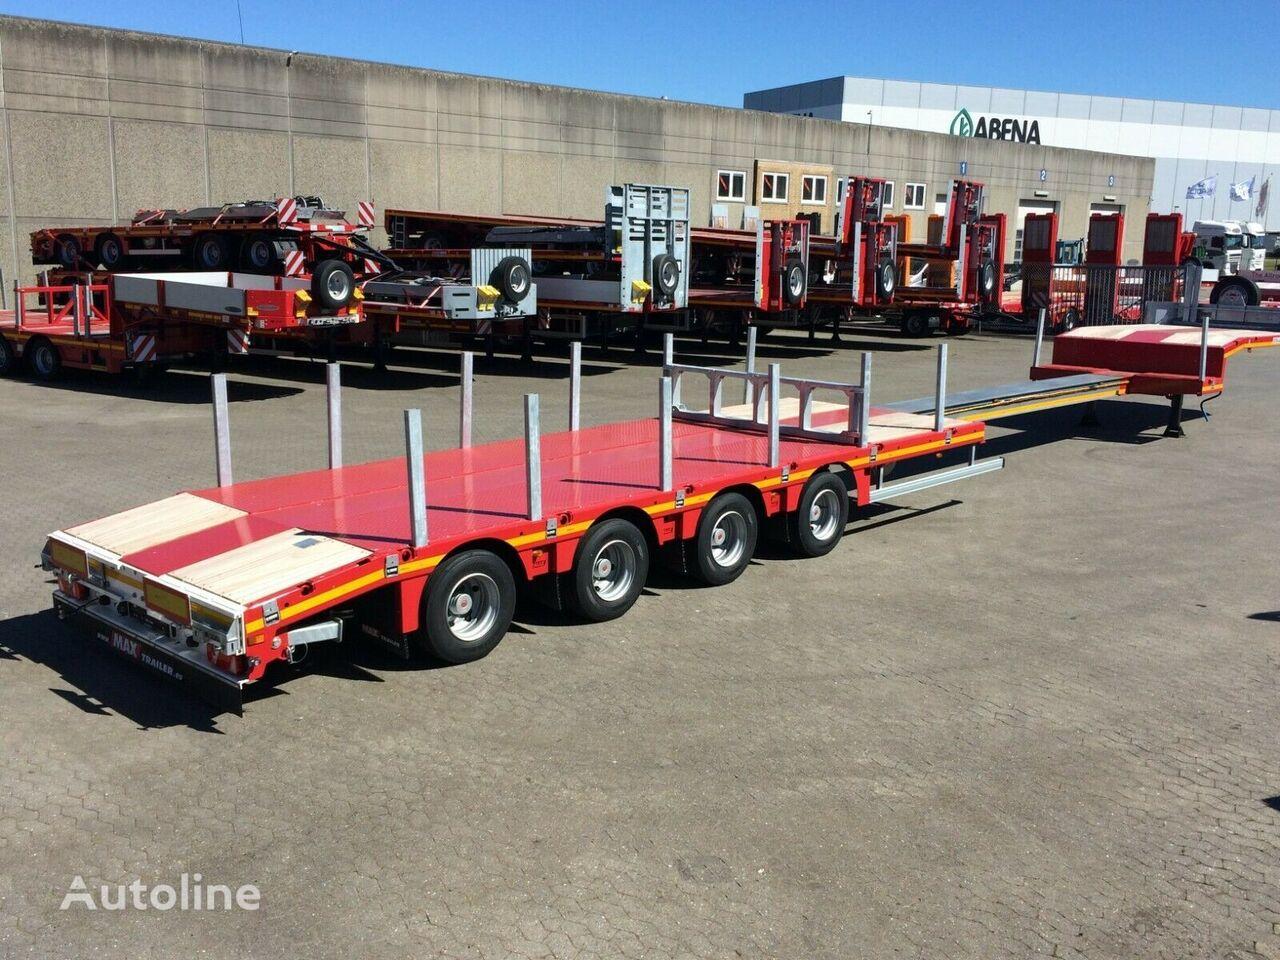 new FAYMONVILLE 6.200 mm telskob low bed semi-trailer